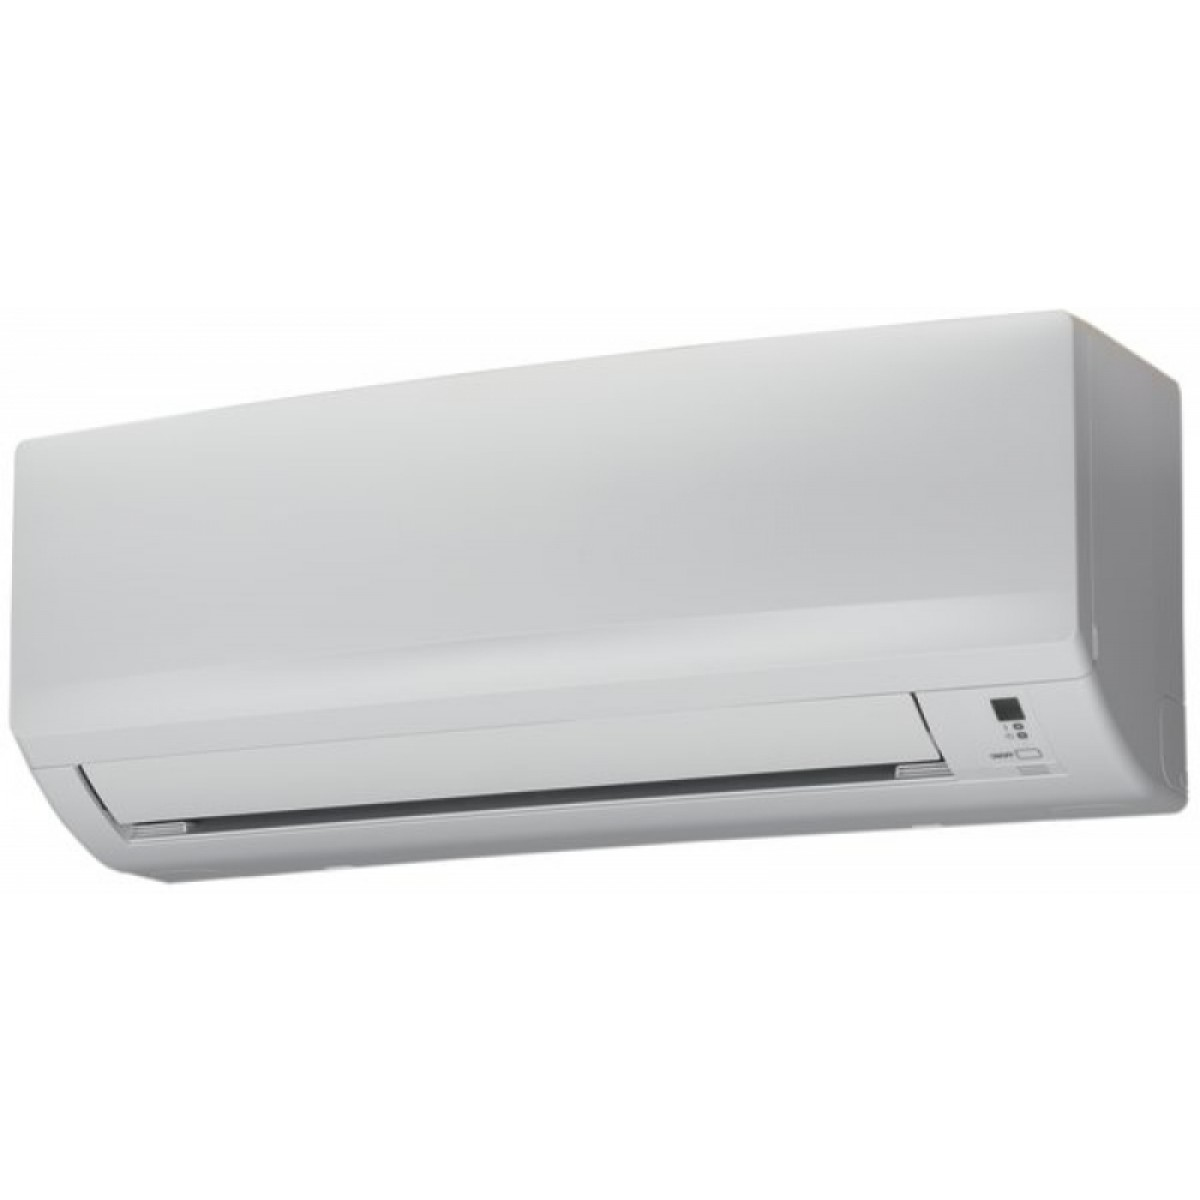 Acs Shop Amp Service Daikin Ftxb35c Rxb35c Klima Uređaji